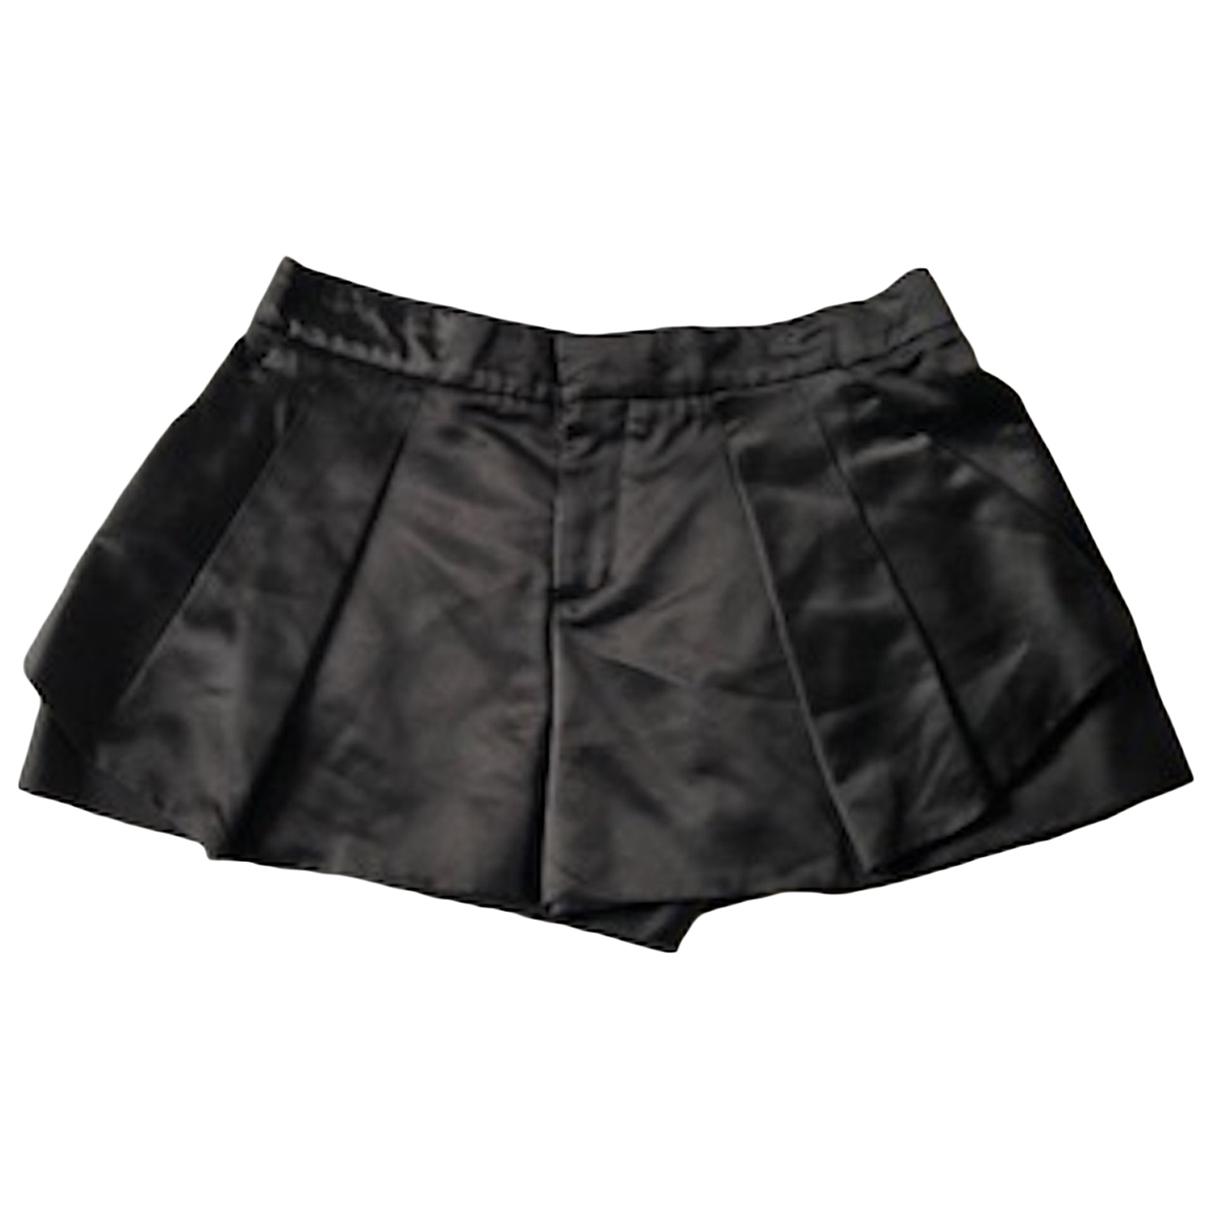 Chloé \N Black Silk Shorts for Women 38 FR